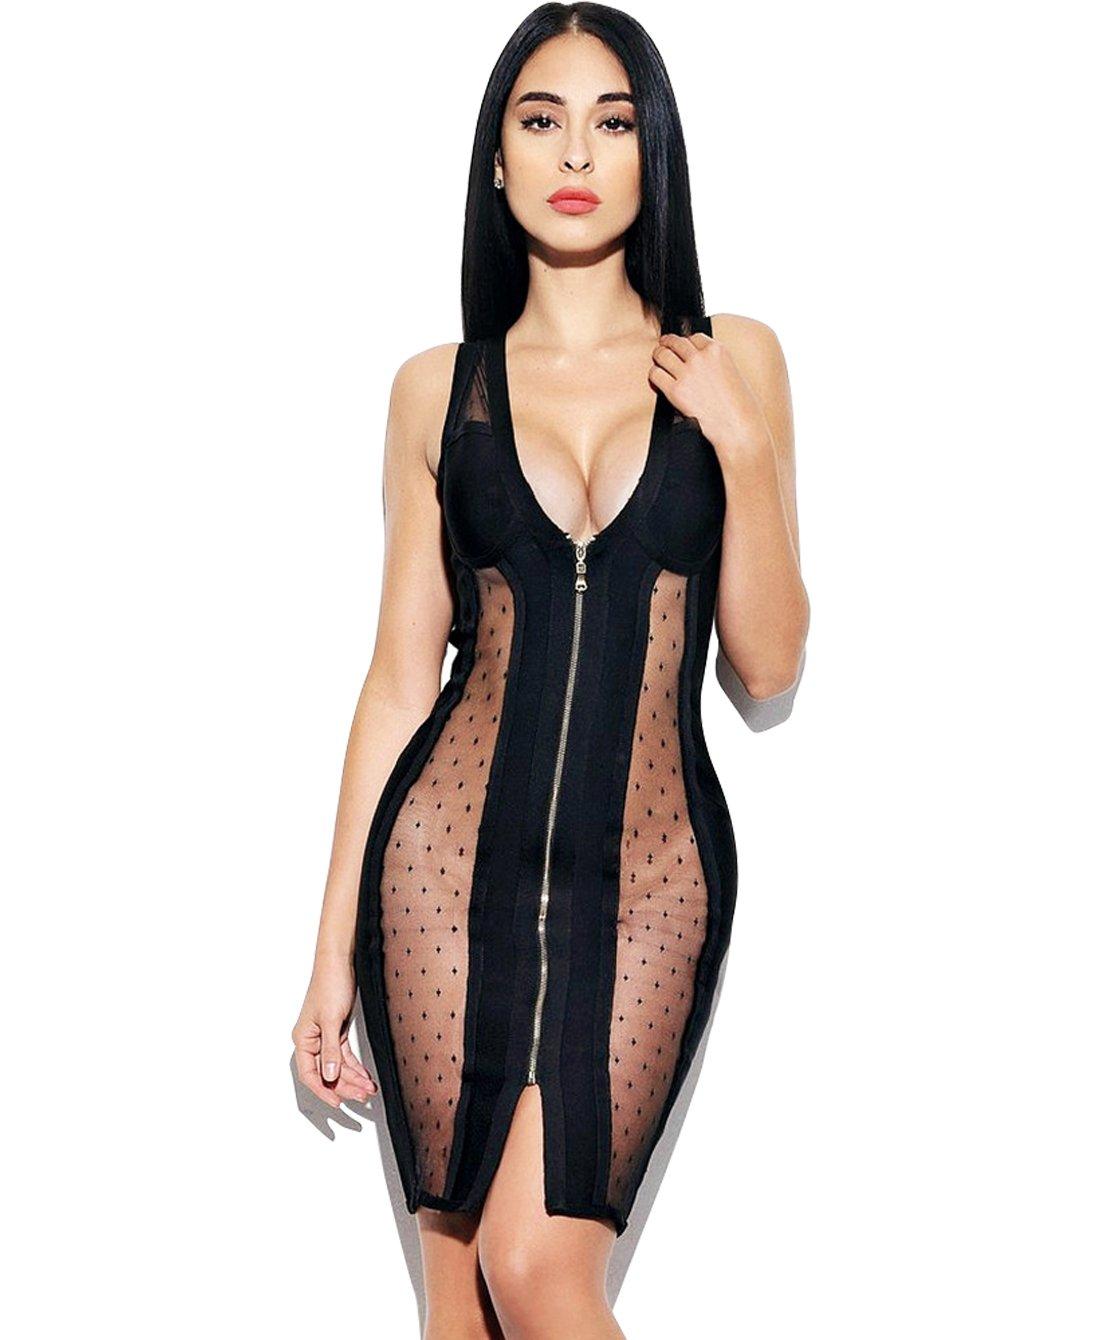 YOLI Women's Sexy Mesh Splicing Sleeveless Deep V Bodycon Dress (XL, Carbon Black)